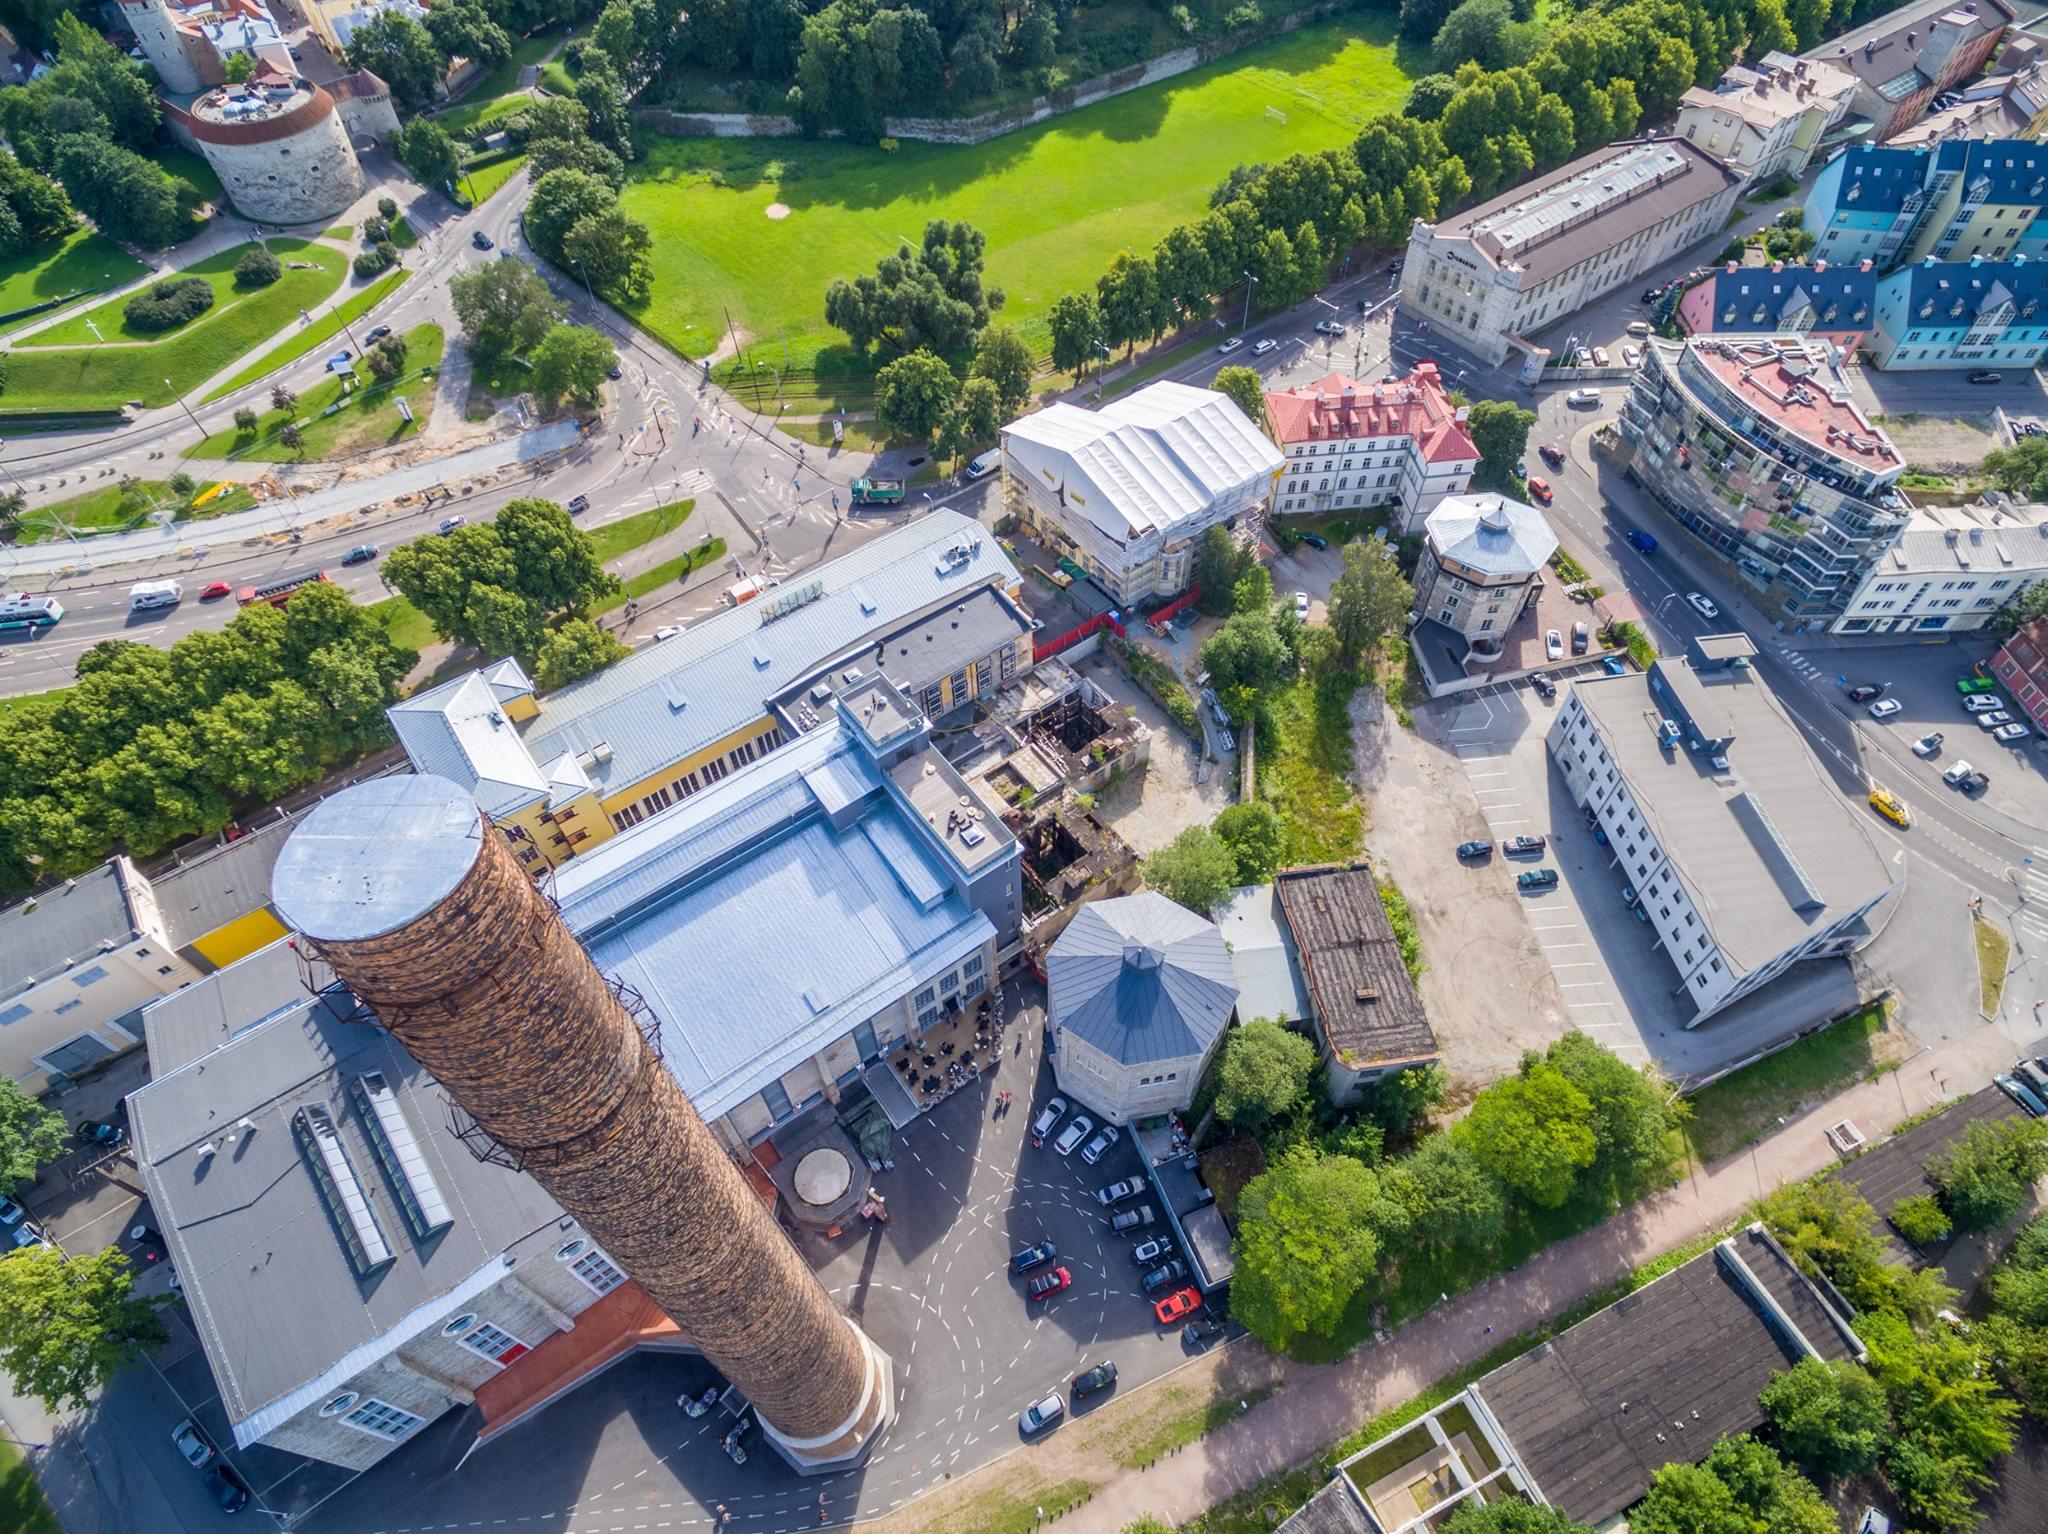 New restaurant opened in Tallinn Creative Hub